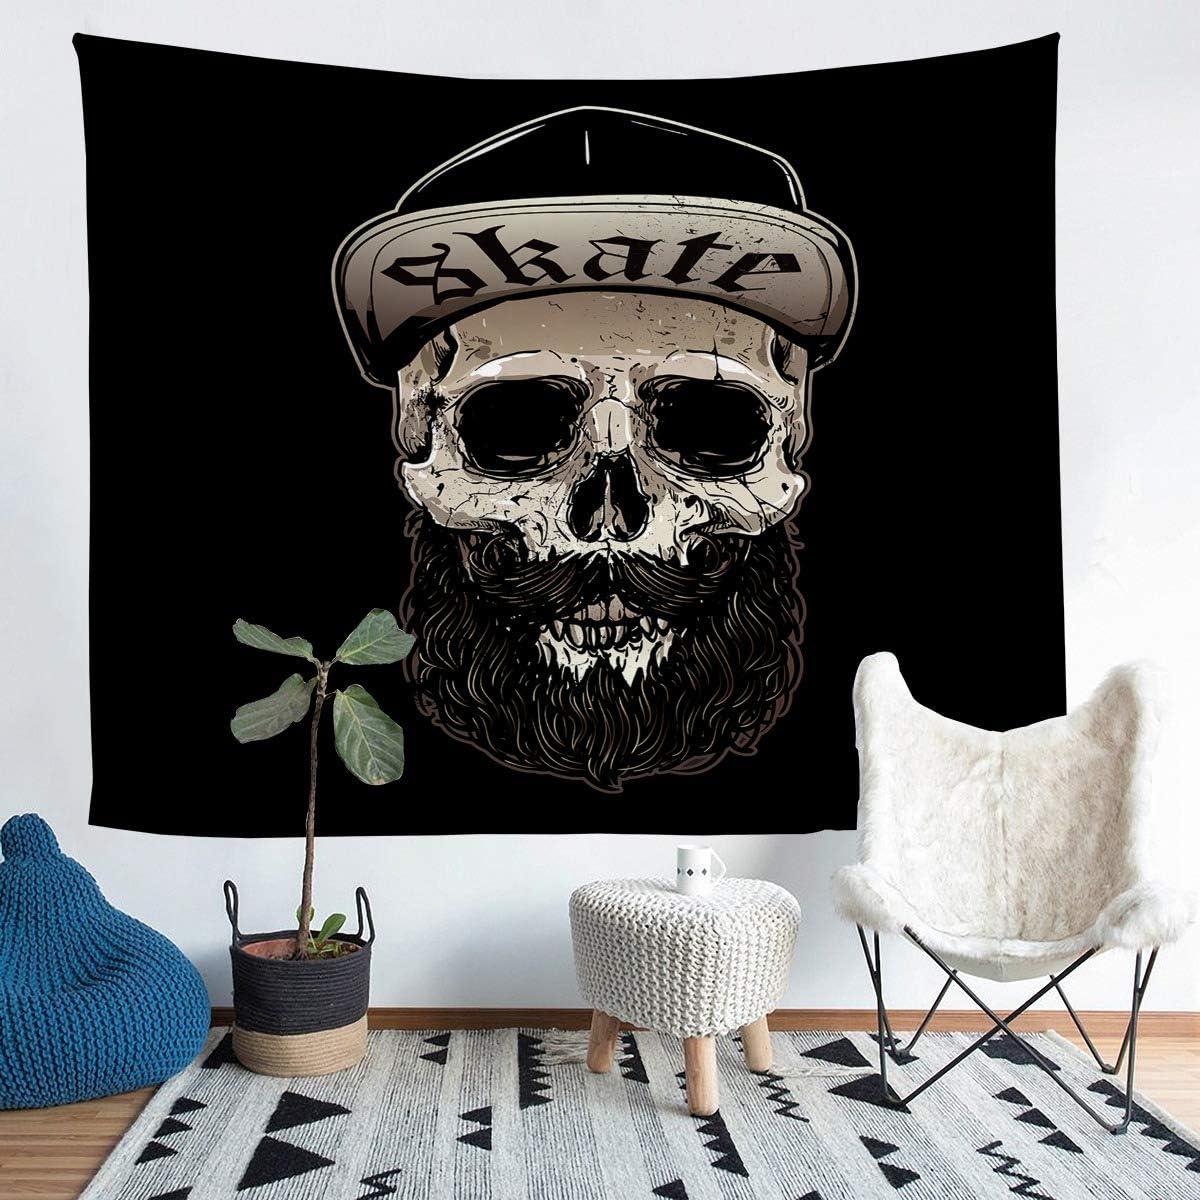 Erosebridal Funny Skull Cover Halloween Bedding Throw Blanket Gothic Tapestries, Beard Tapestry, Black Art Home for Living Room Decoration Medium 59x59, Fashion Outdoor